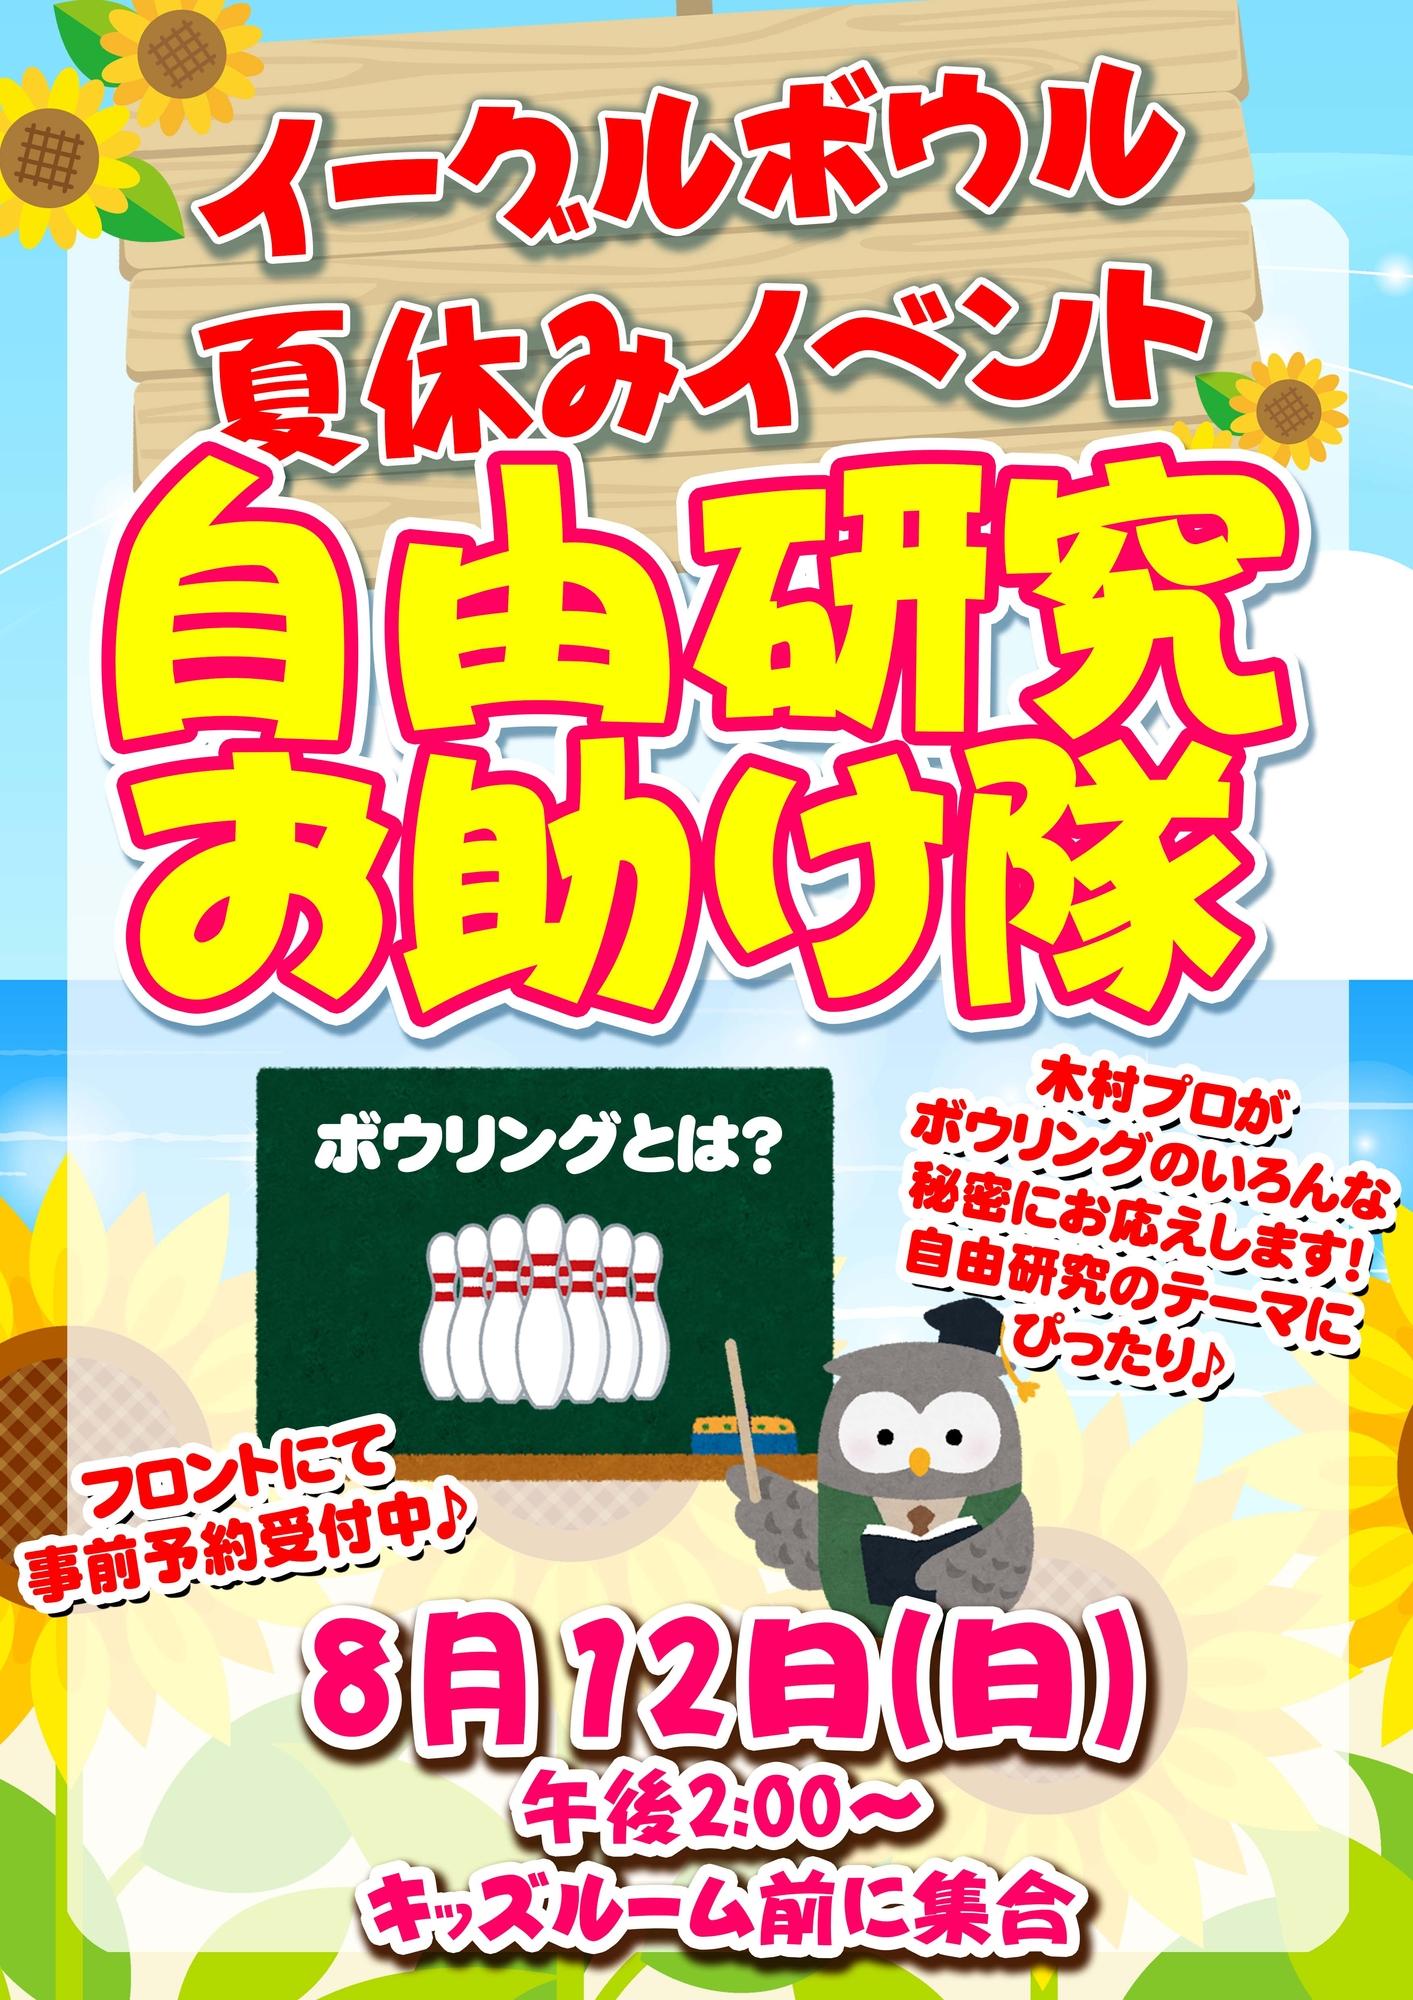 納涼祭-自由研究お助け隊